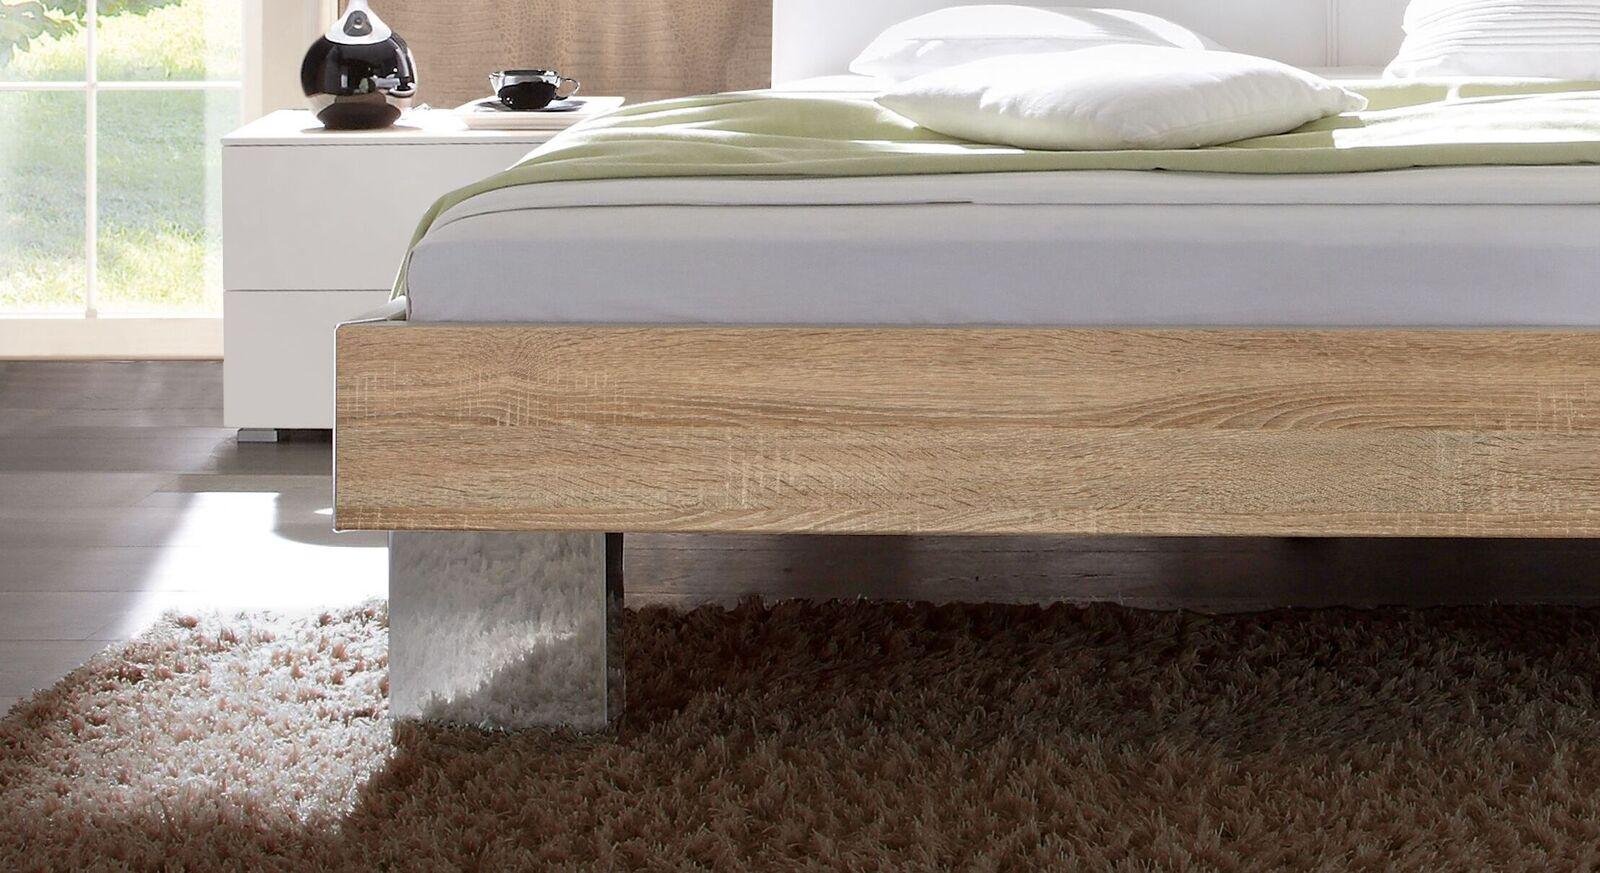 Bett Cassio mit verchromten Metallfüßen